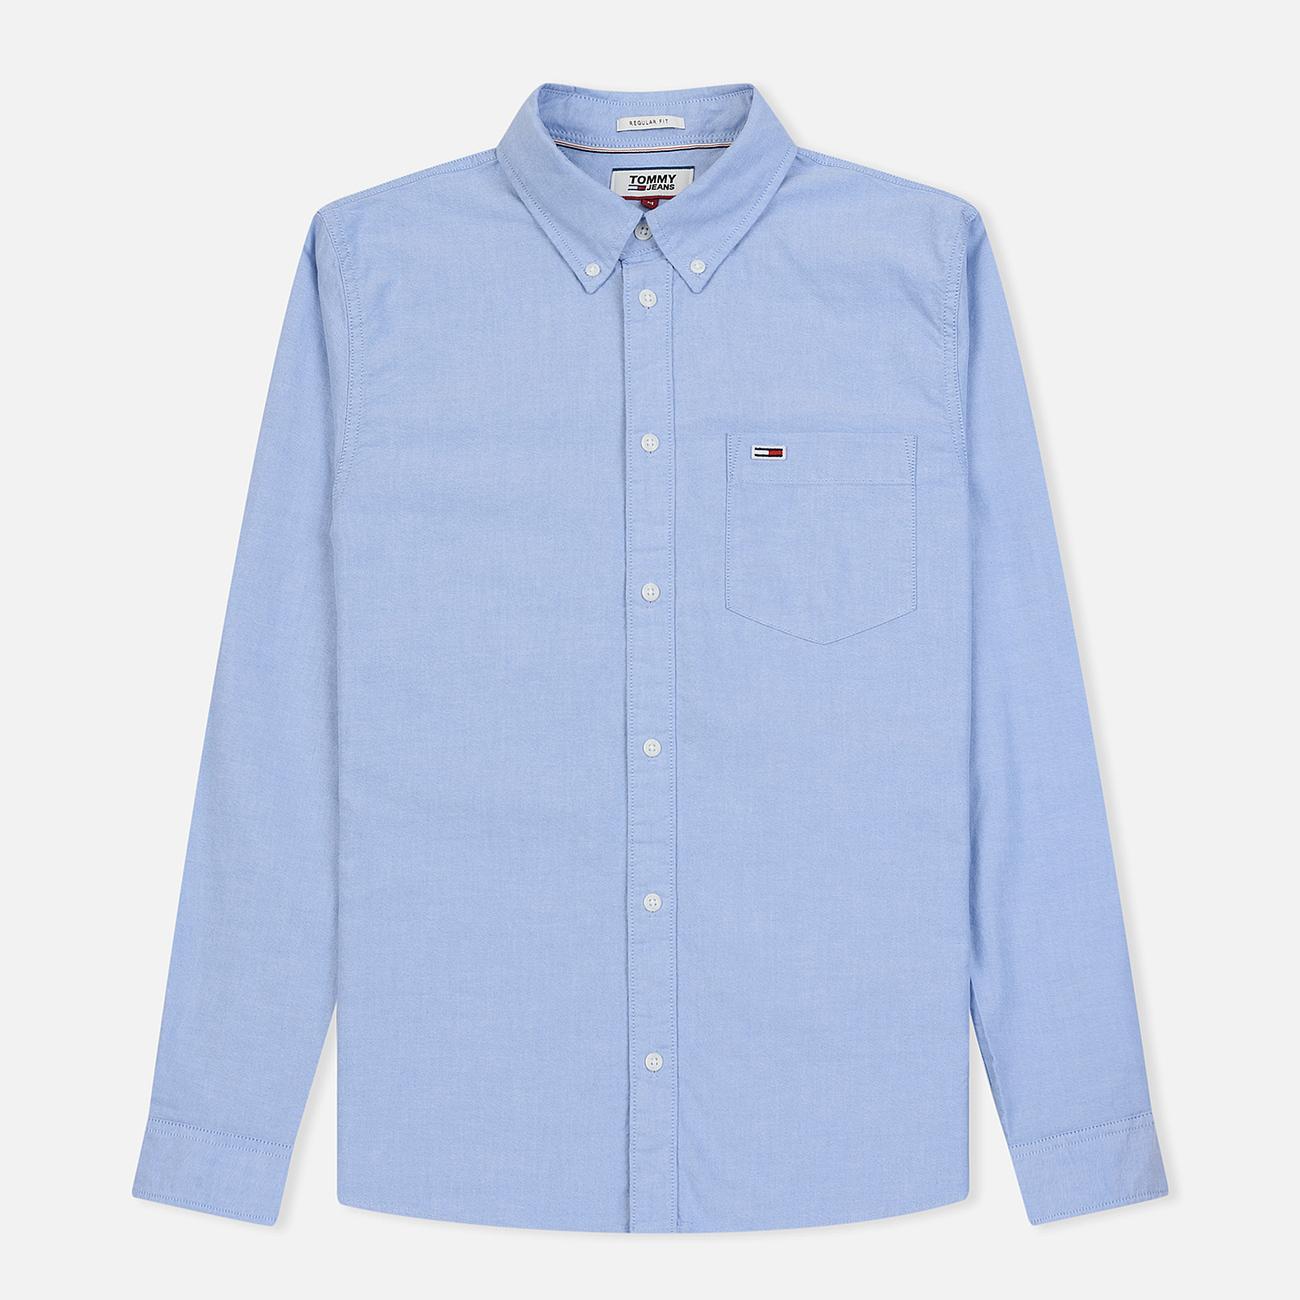 Мужская рубашка Tommy Jeans Classics Oxford Light Blue